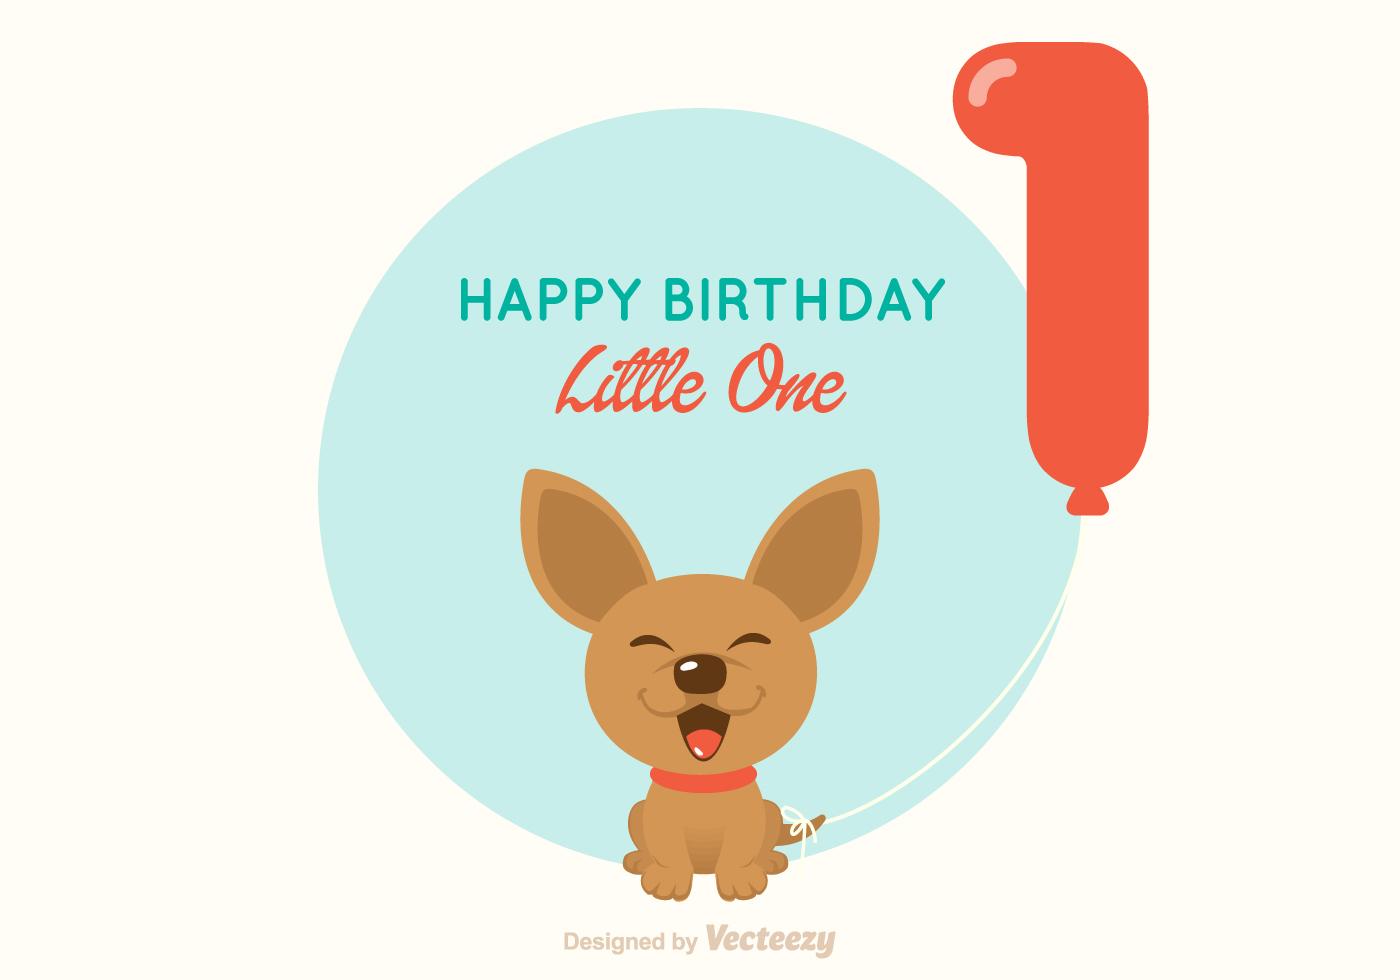 Chihuahua 1st birthday vector card download free vector art stock chihuahua 1st birthday vector card download free vector art stock graphics images stopboris Gallery